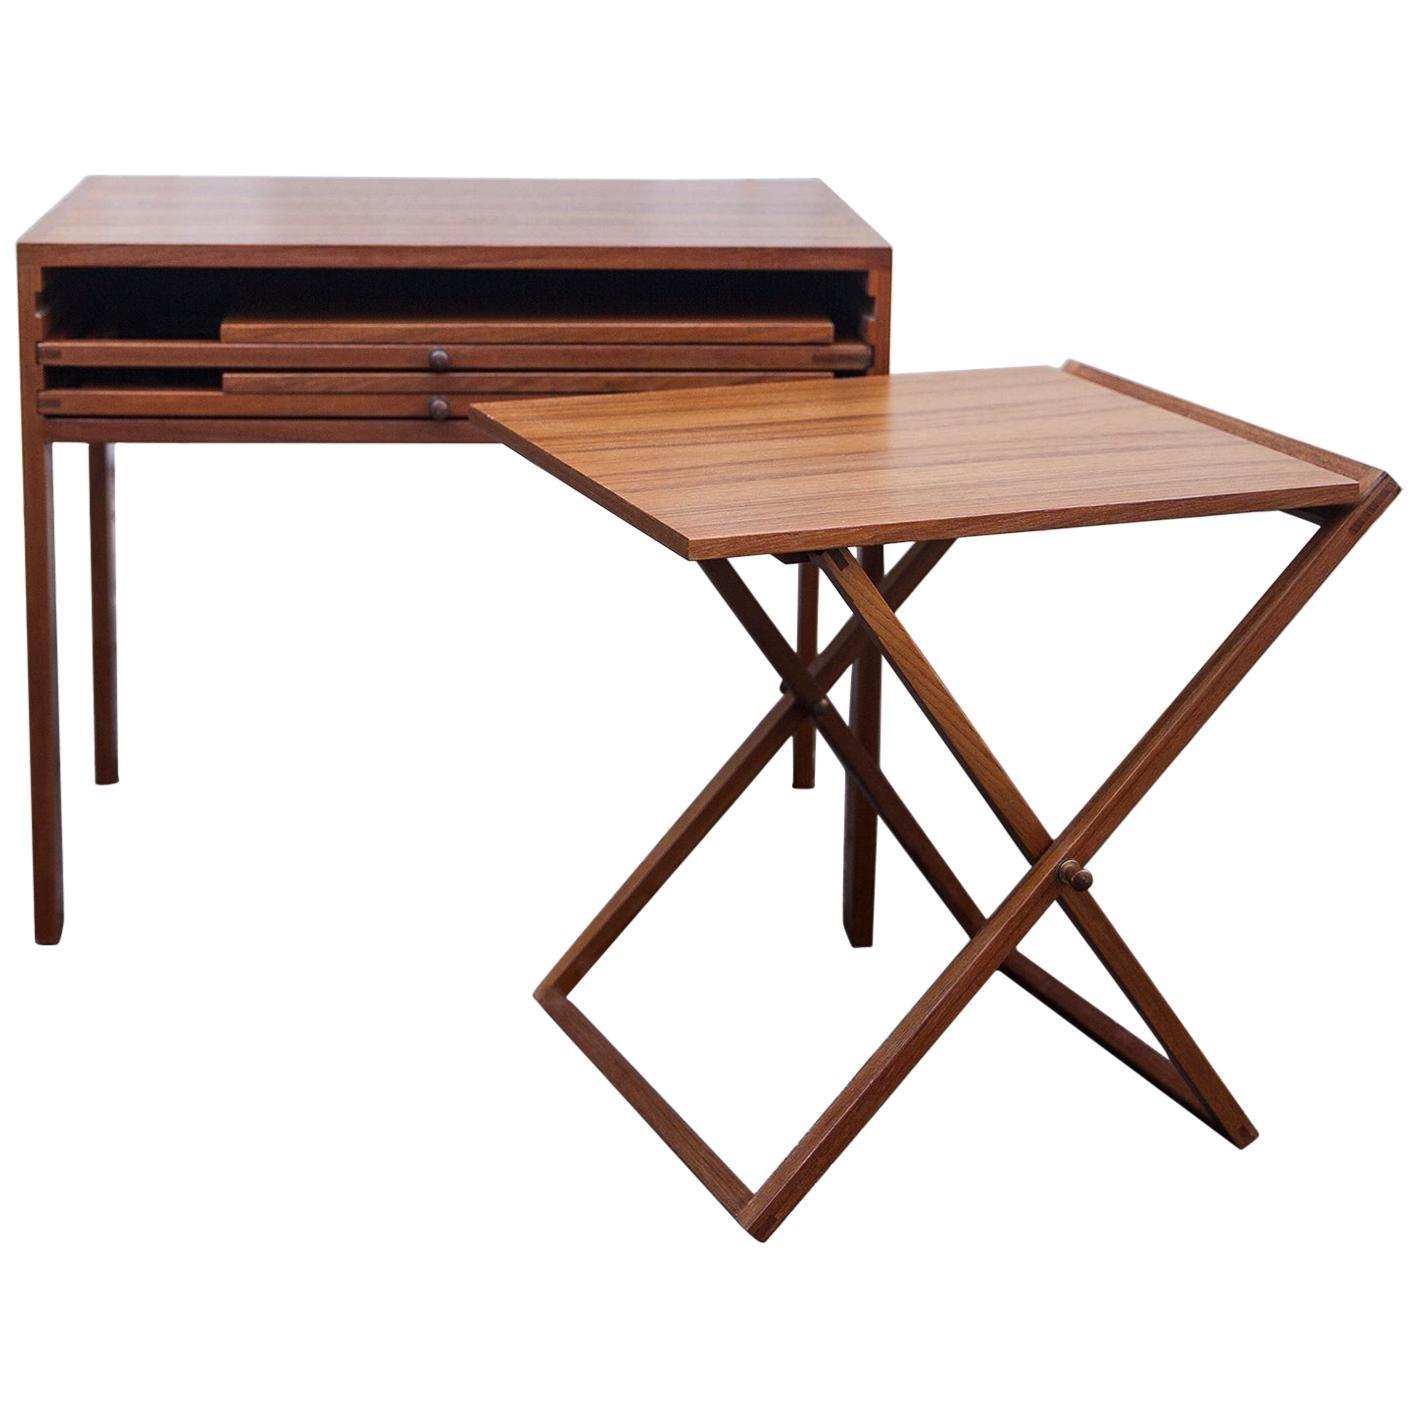 Illum Wikkelso Teak Folding Table, 1960s